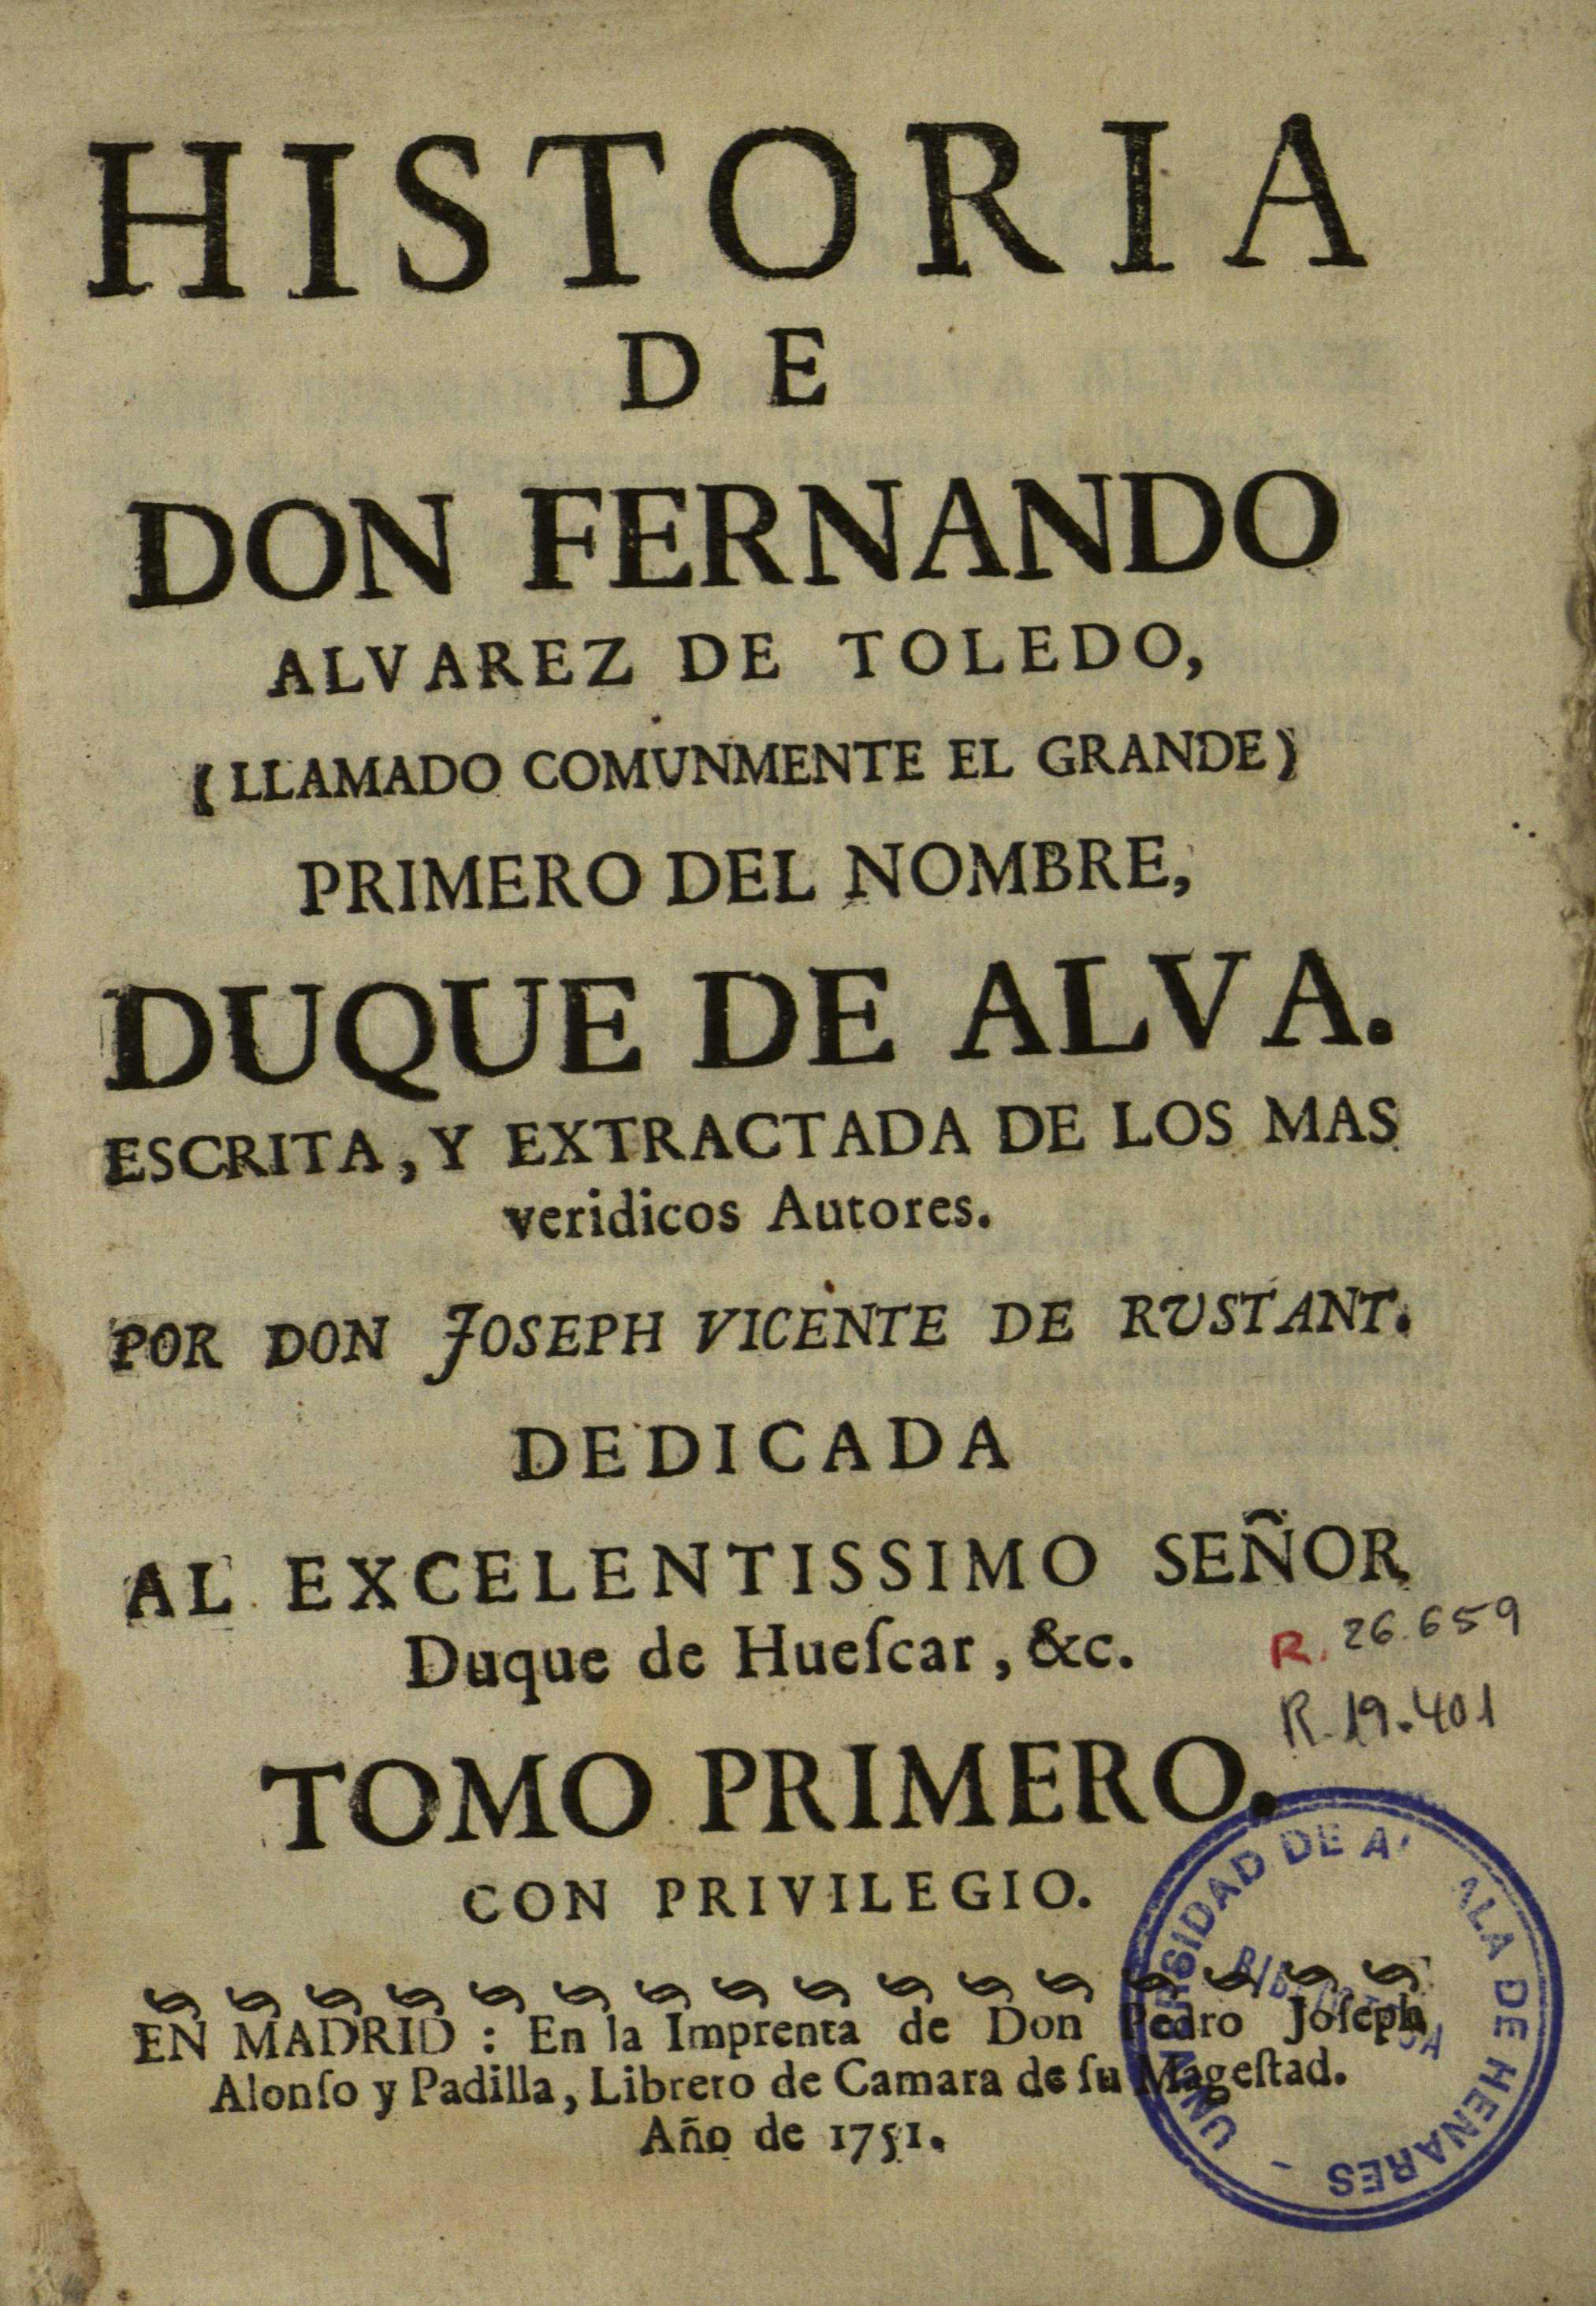 Historia de don Fernando Alvarez de Toledo ..., 1751